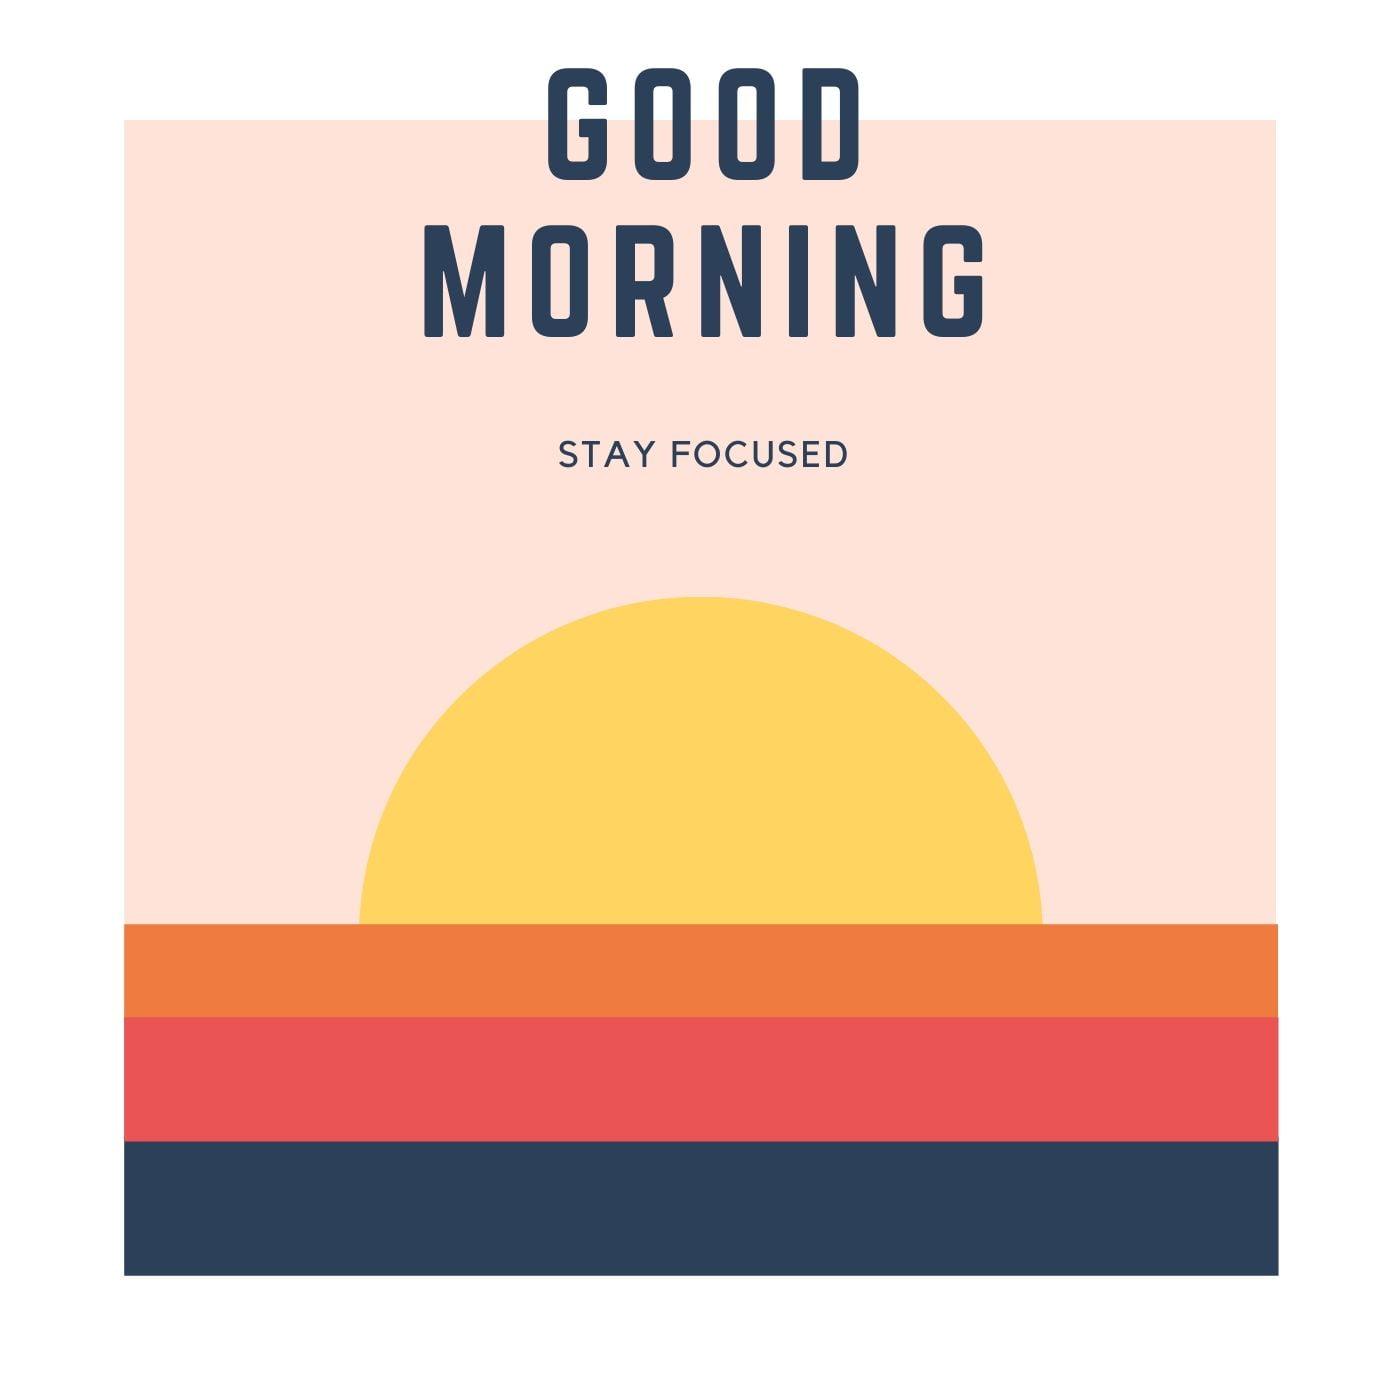 Sun rising Sketch Good Morning Image full HD free download.